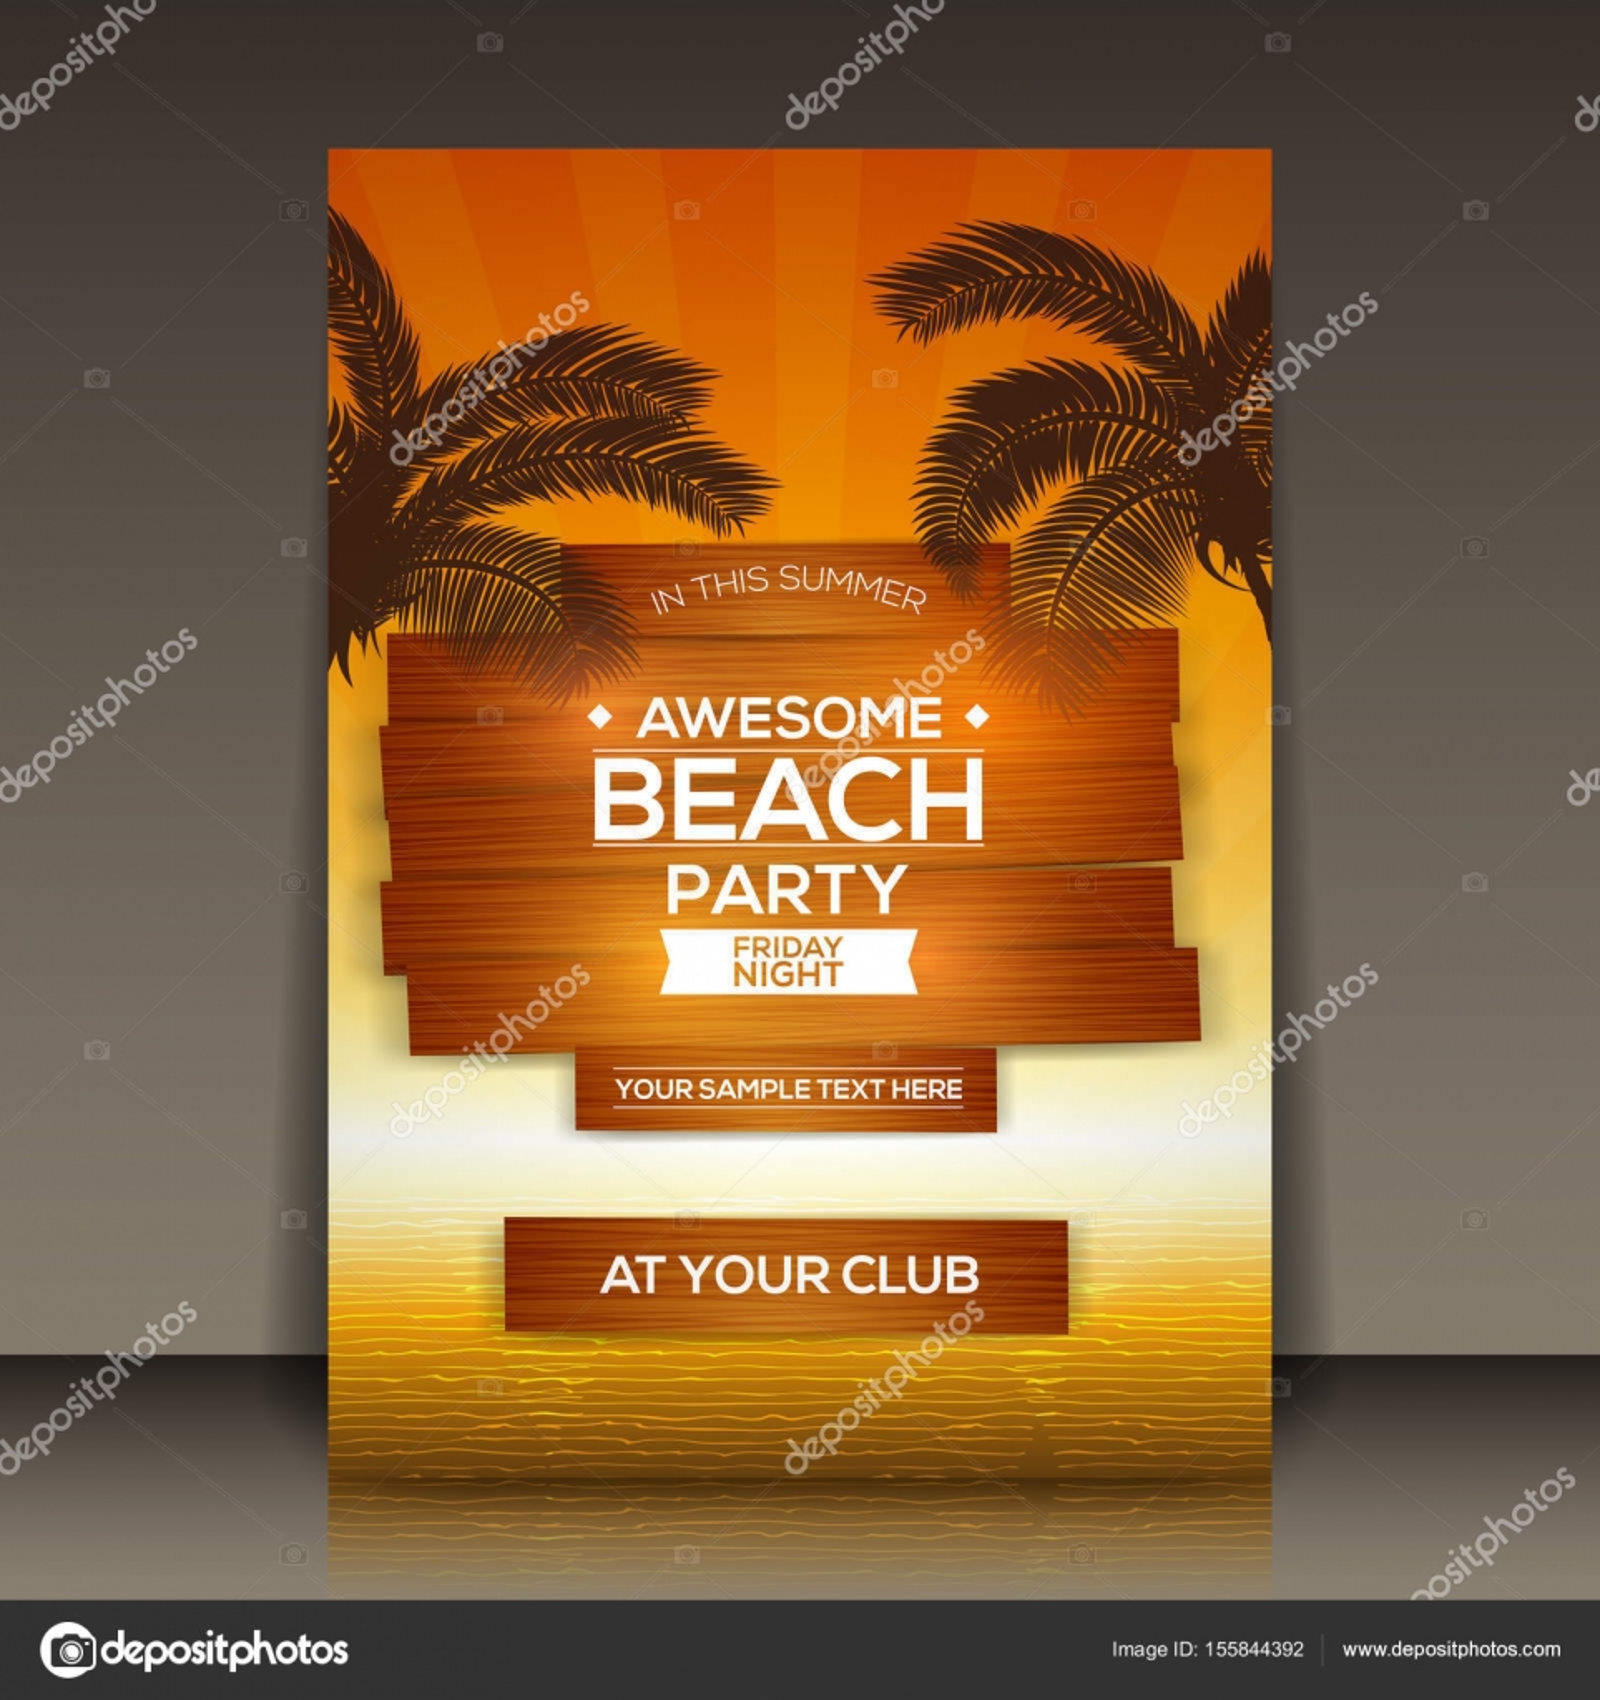 Beach Party Flyer Template — Stock Vector © hunthomas #155844392